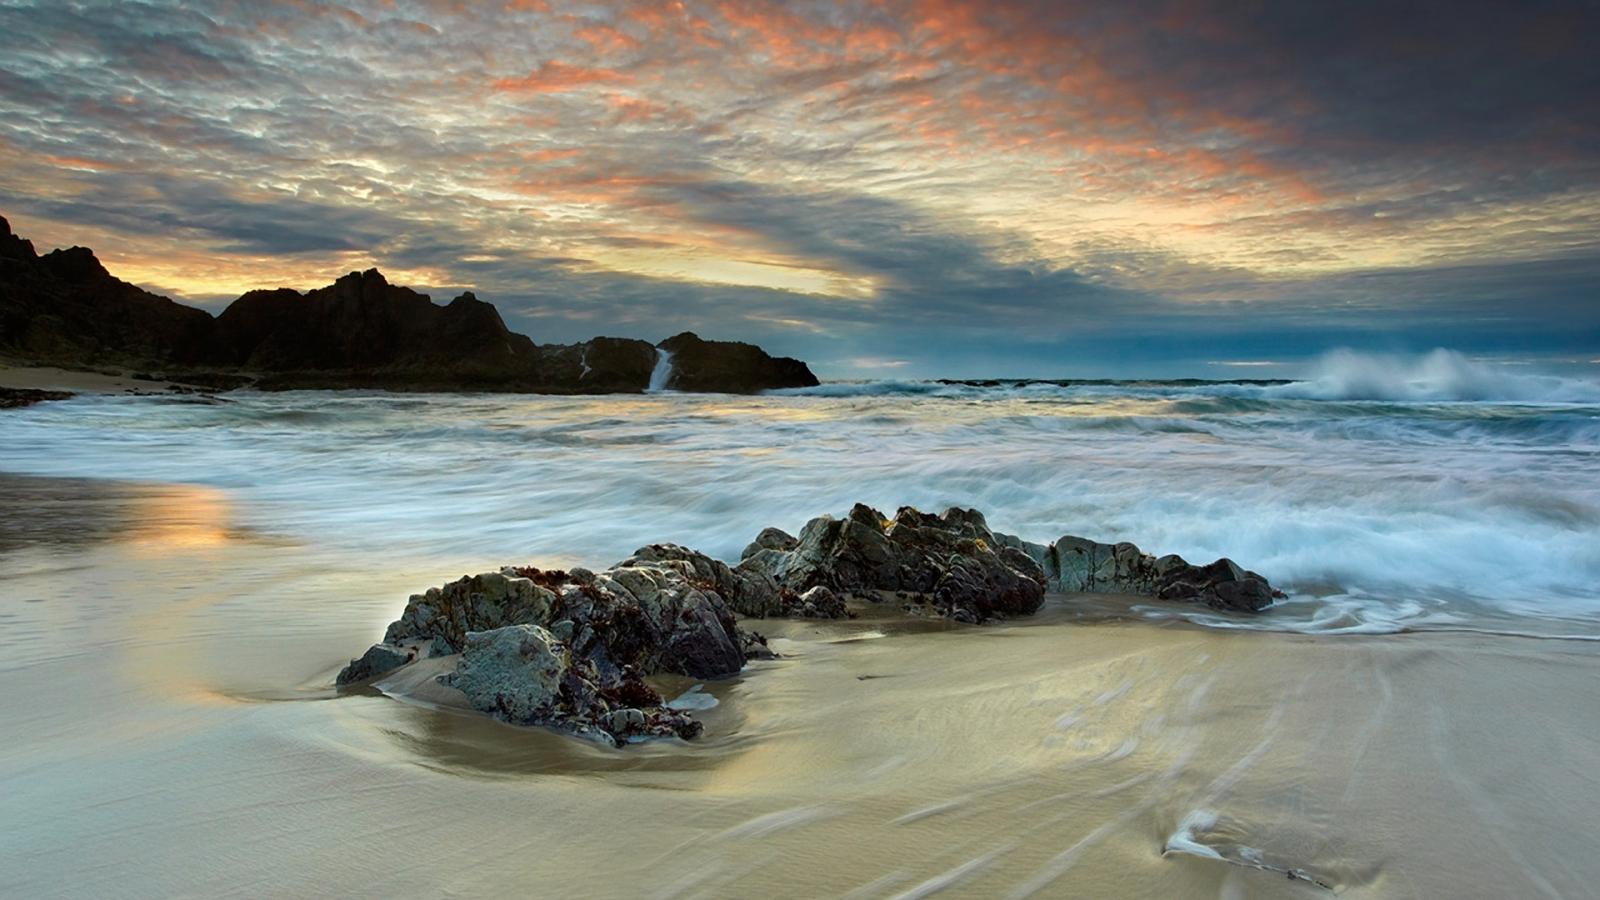 Beach Scenery 1600 x 900 HDTV Wallpaper